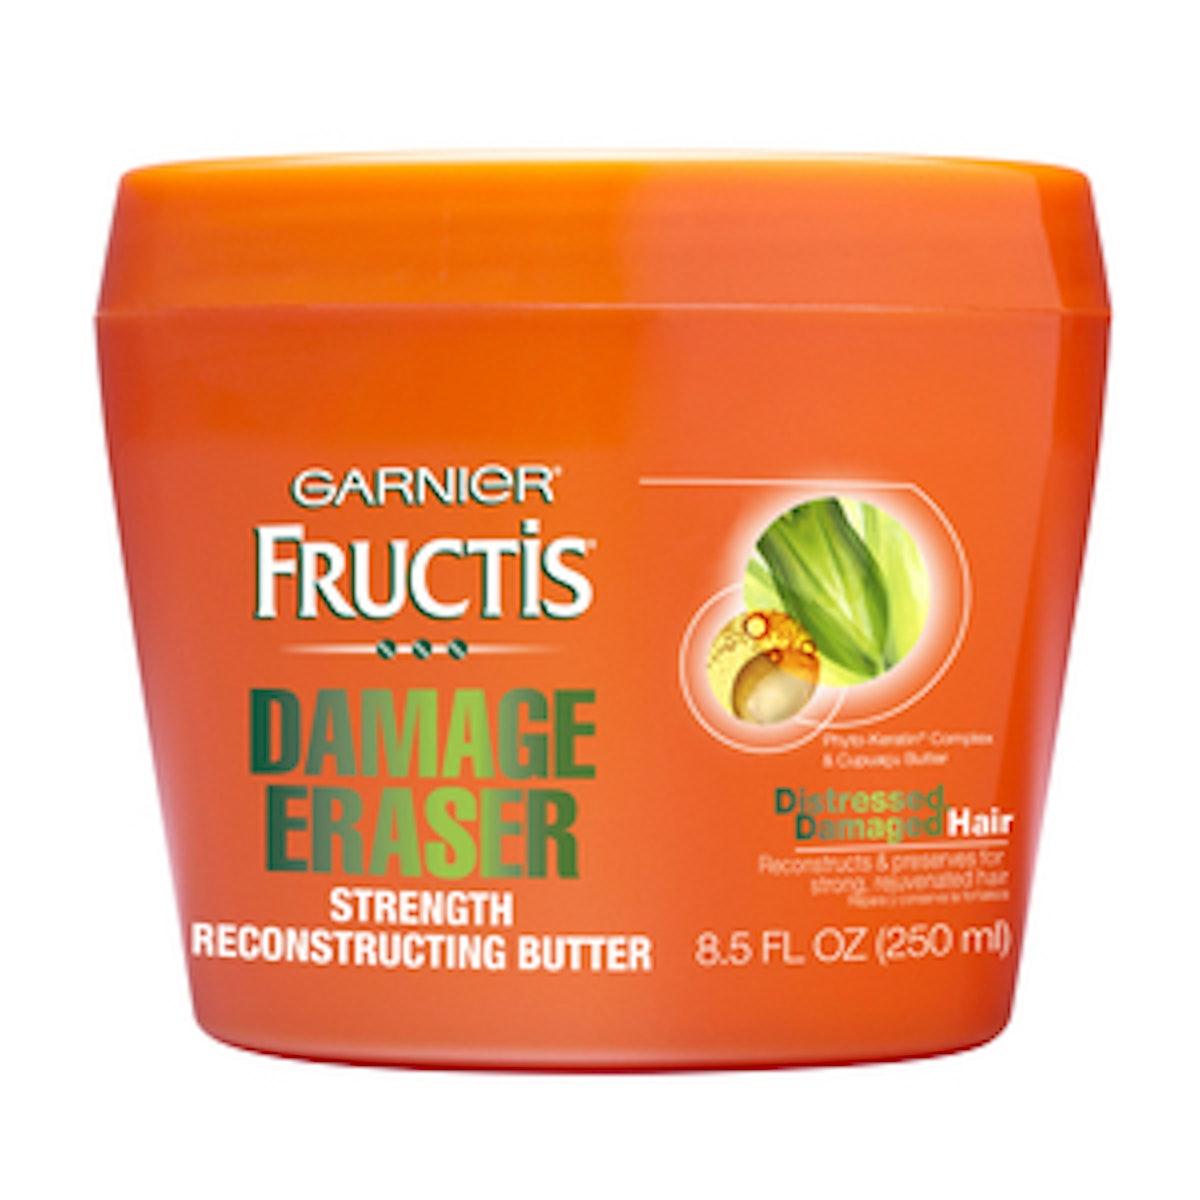 Garnier Fructis Style Damage Eraser Strength Reconstructing Butter